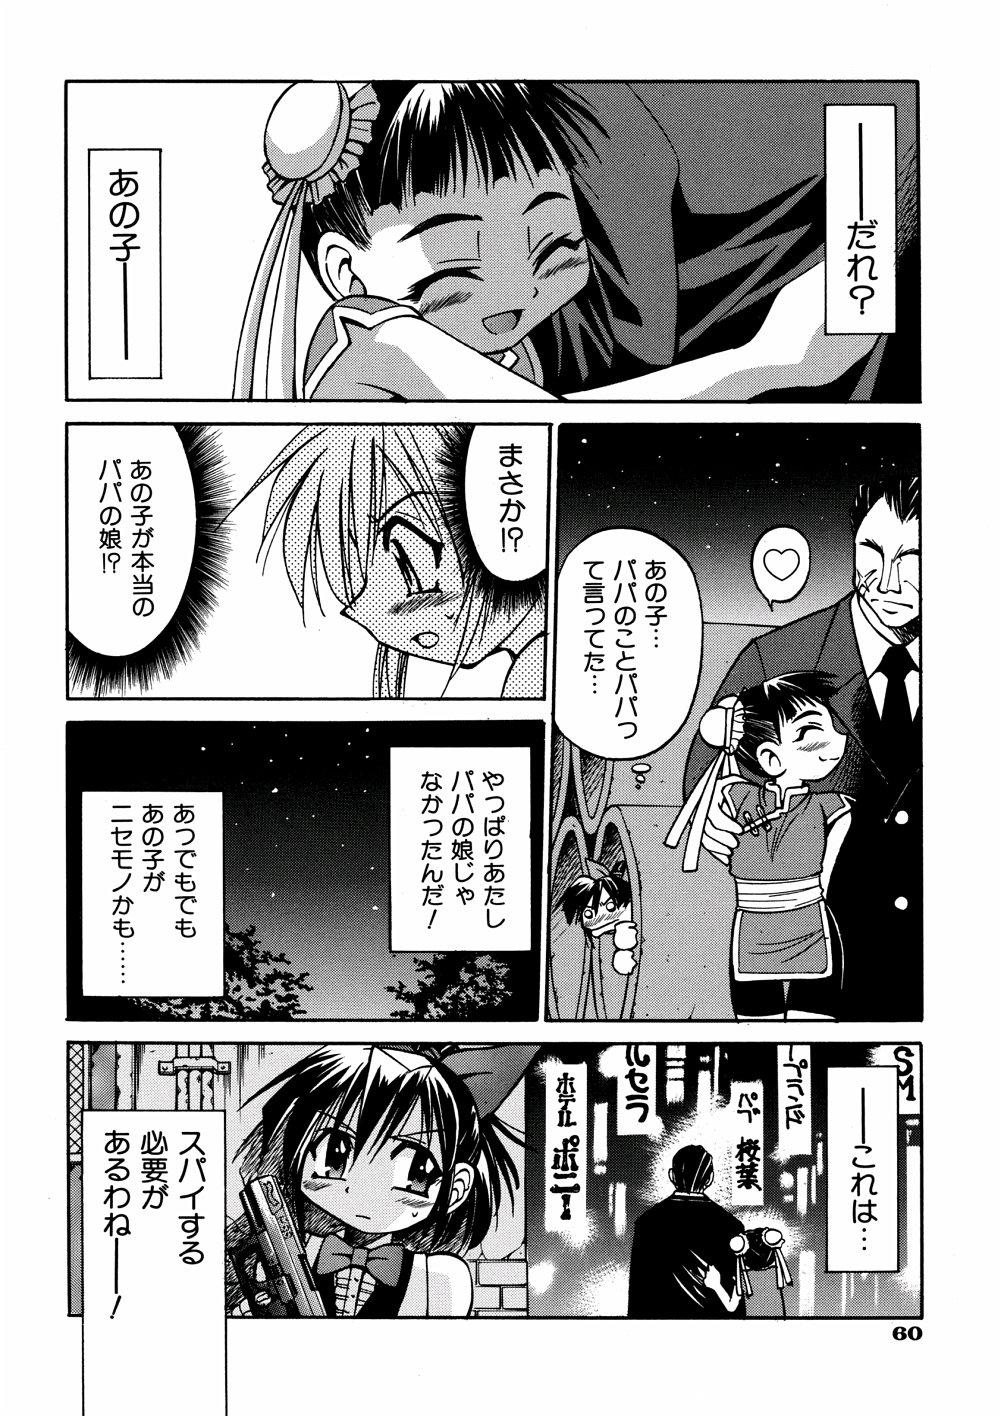 00 Nanako - Agent Nanako 62